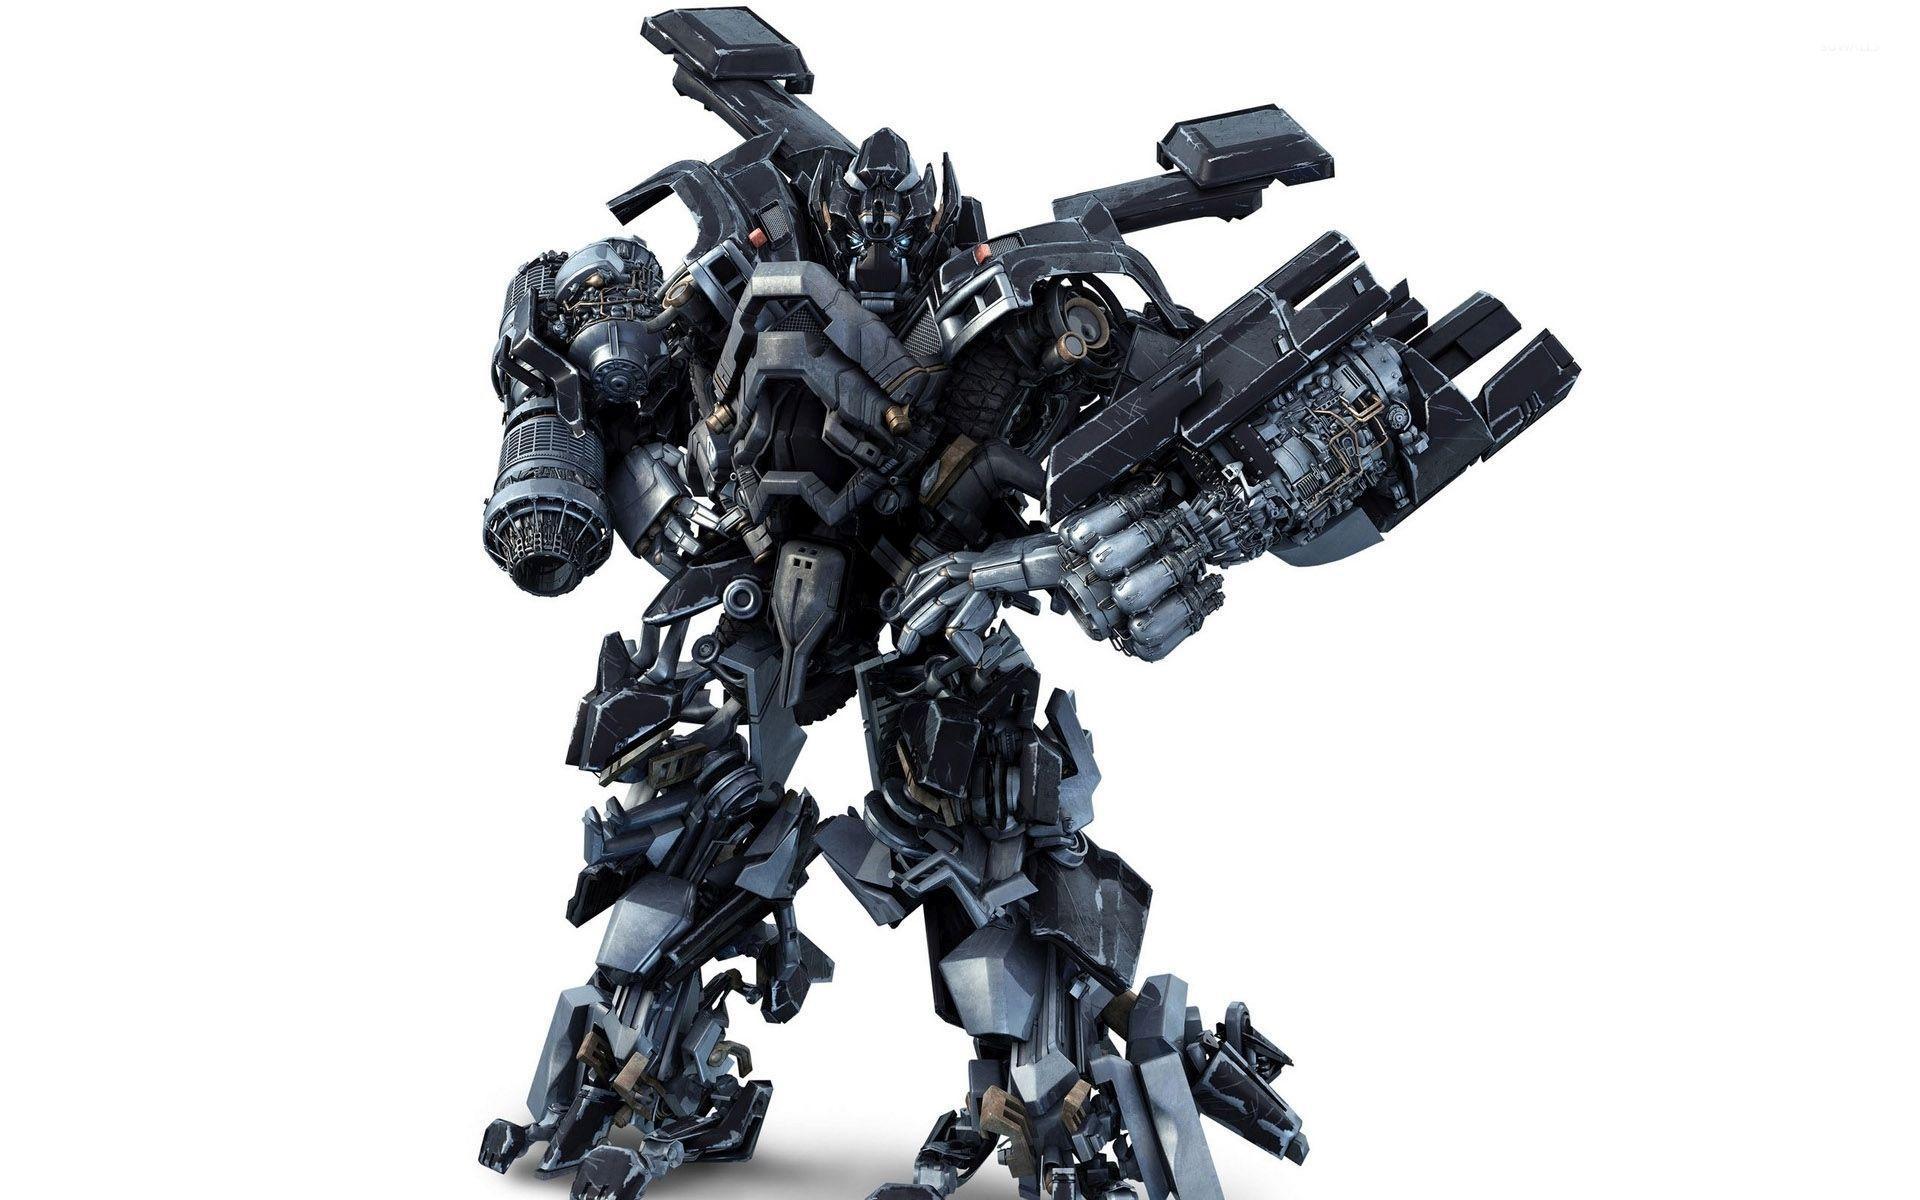 Transformers 2 Autobots Wallpapers Wallpaper Cave